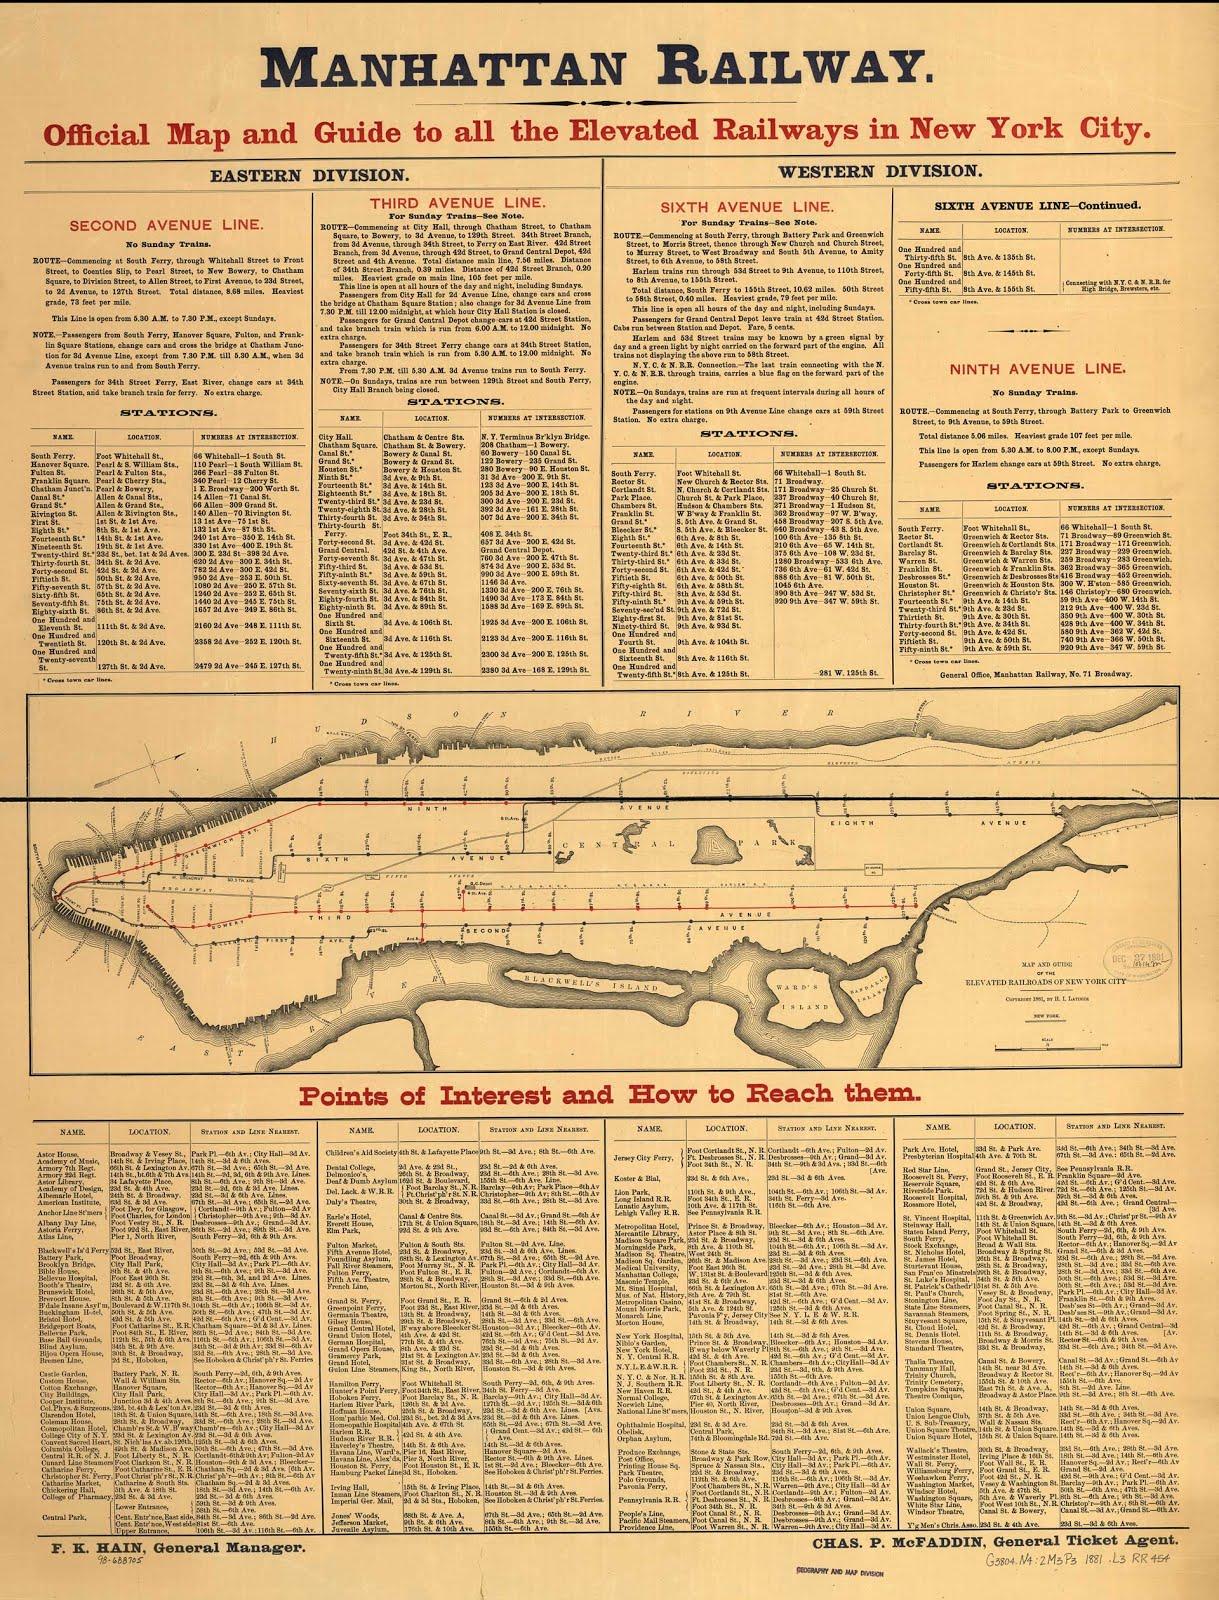 Mta Subway Map 101 2001.The Launch Box 2013